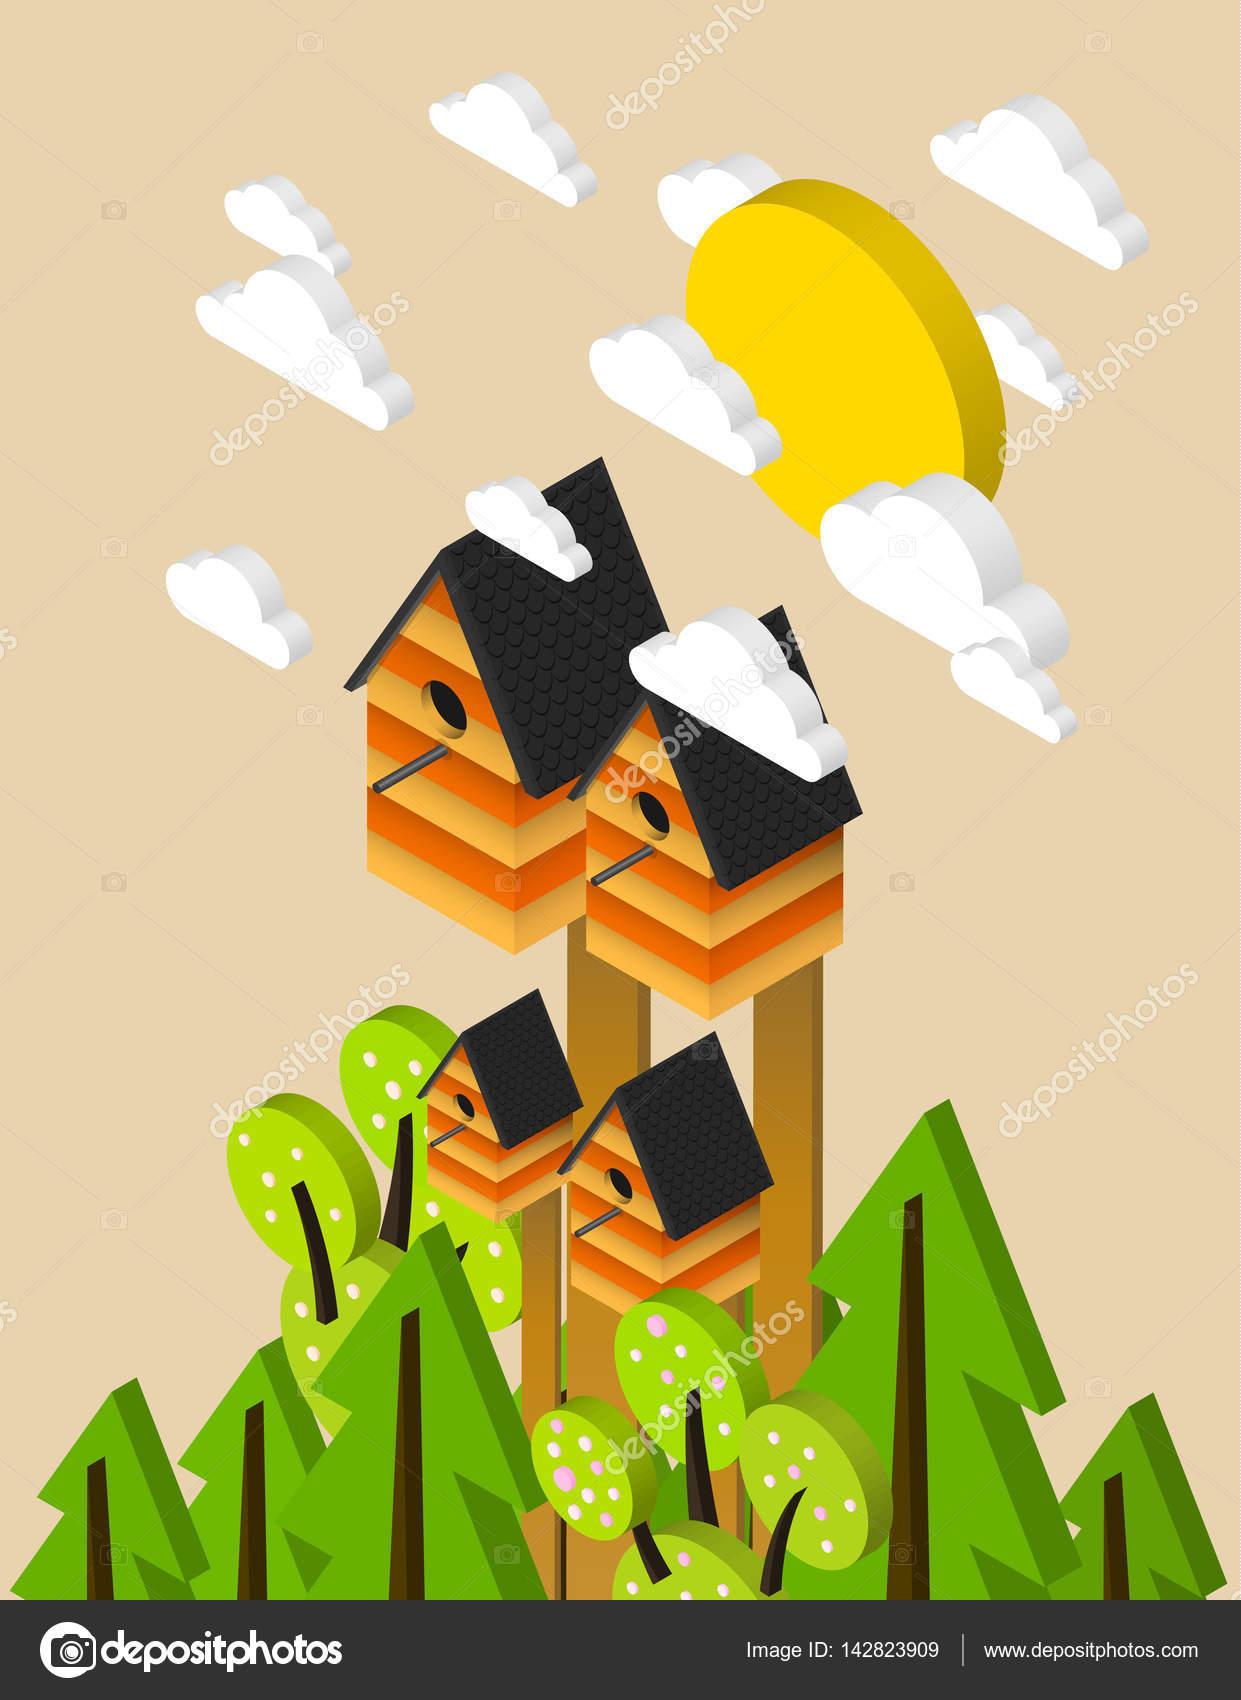 Nesting box, isometric illustration, fresh spring poster